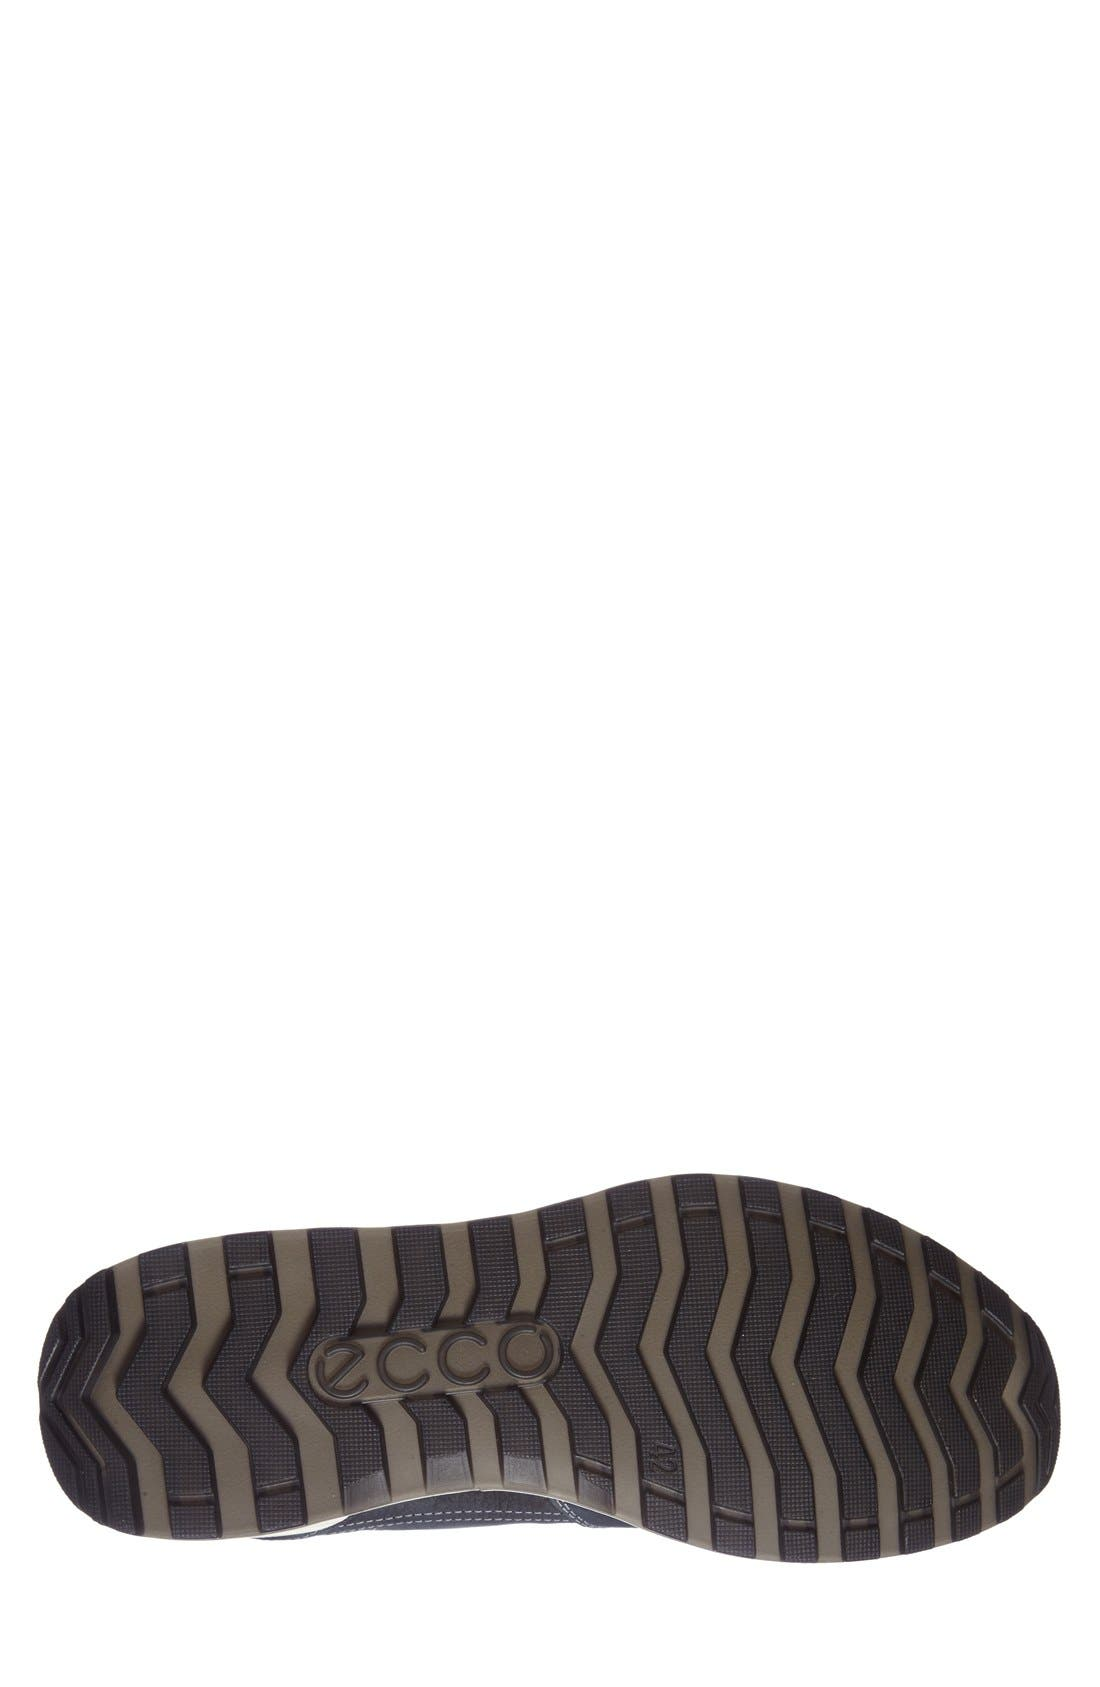 'CS14' Sneaker,                             Alternate thumbnail 2, color,                             015